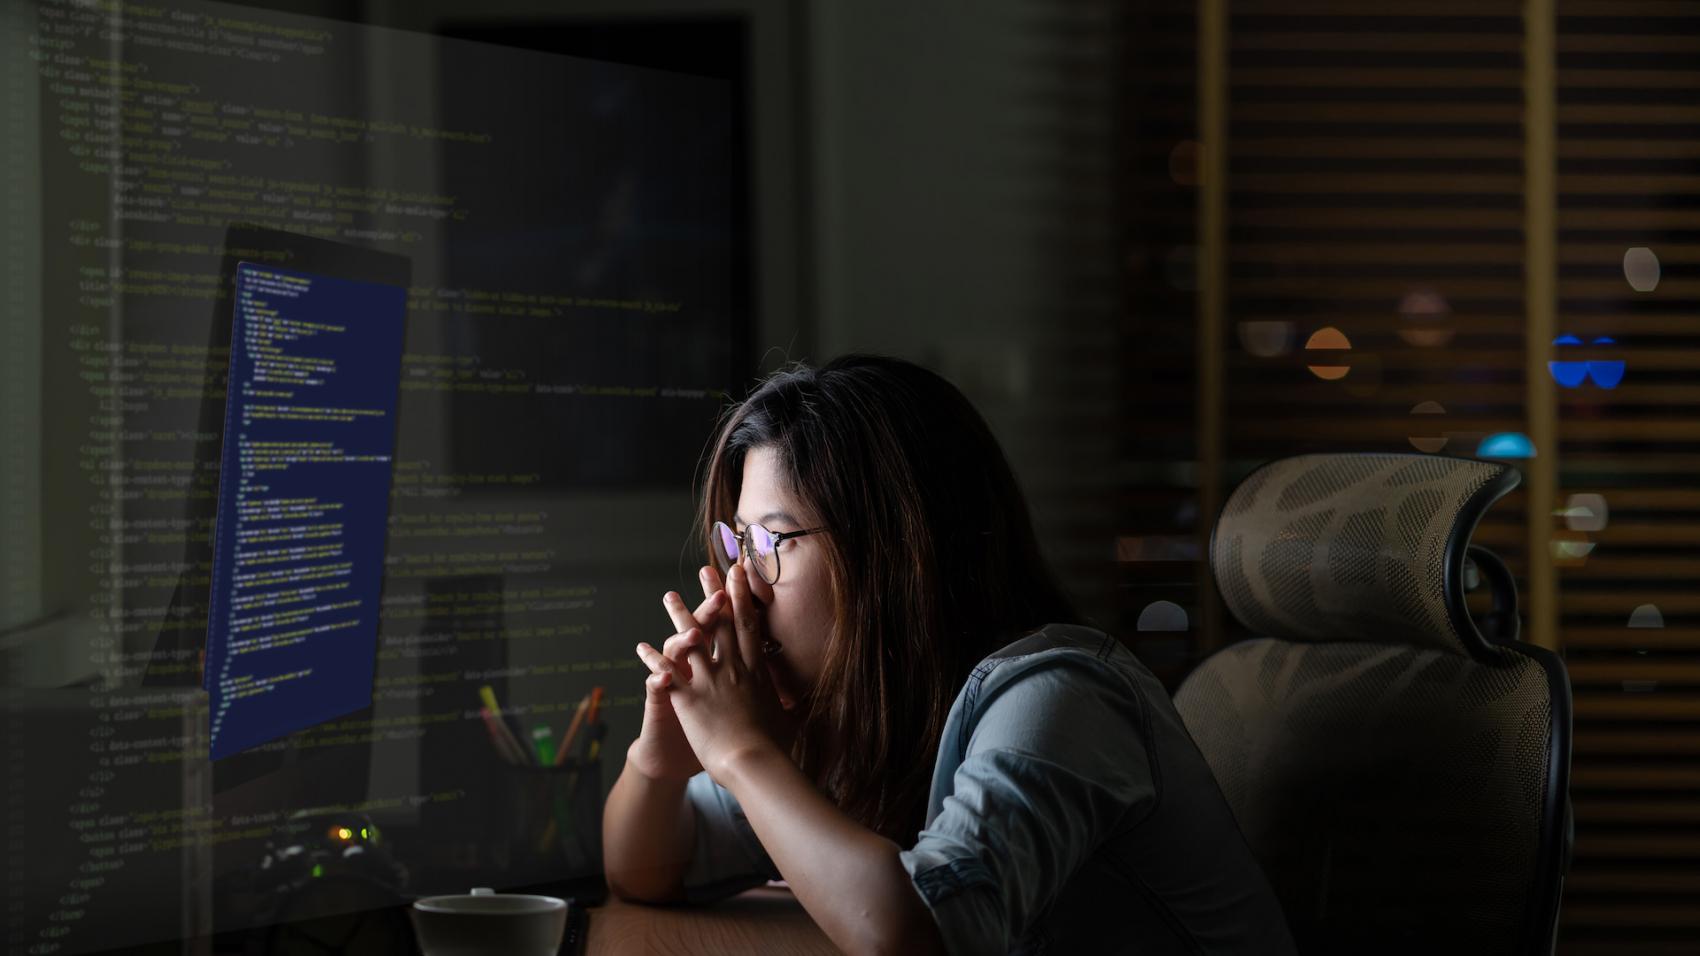 woman thinking of hard coding